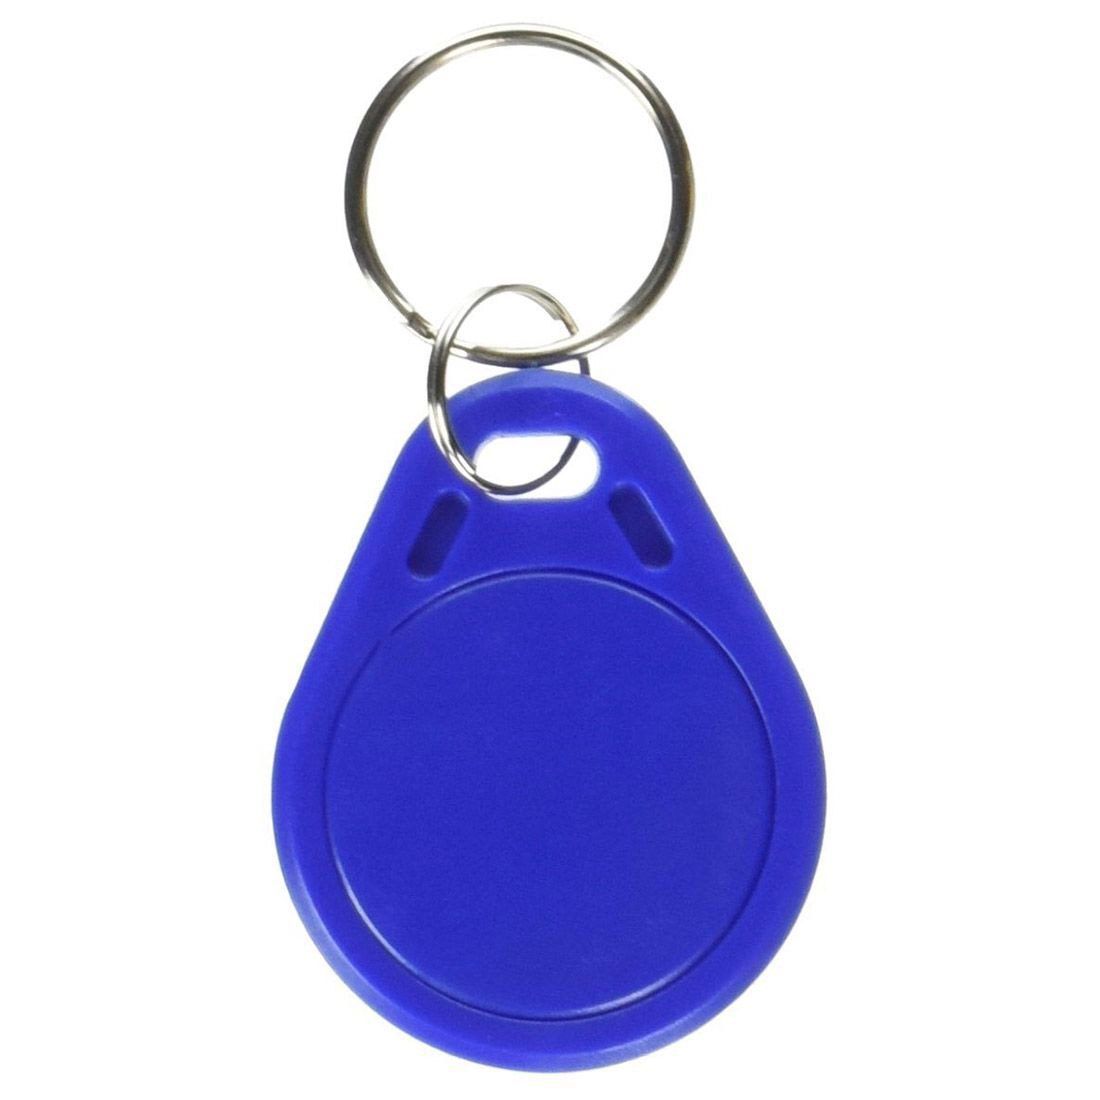 MOOL 20 pcs Mifare Card 13.56 MHz Blue Close IC Smart Induction Card Key Chain ic card 10 pcs